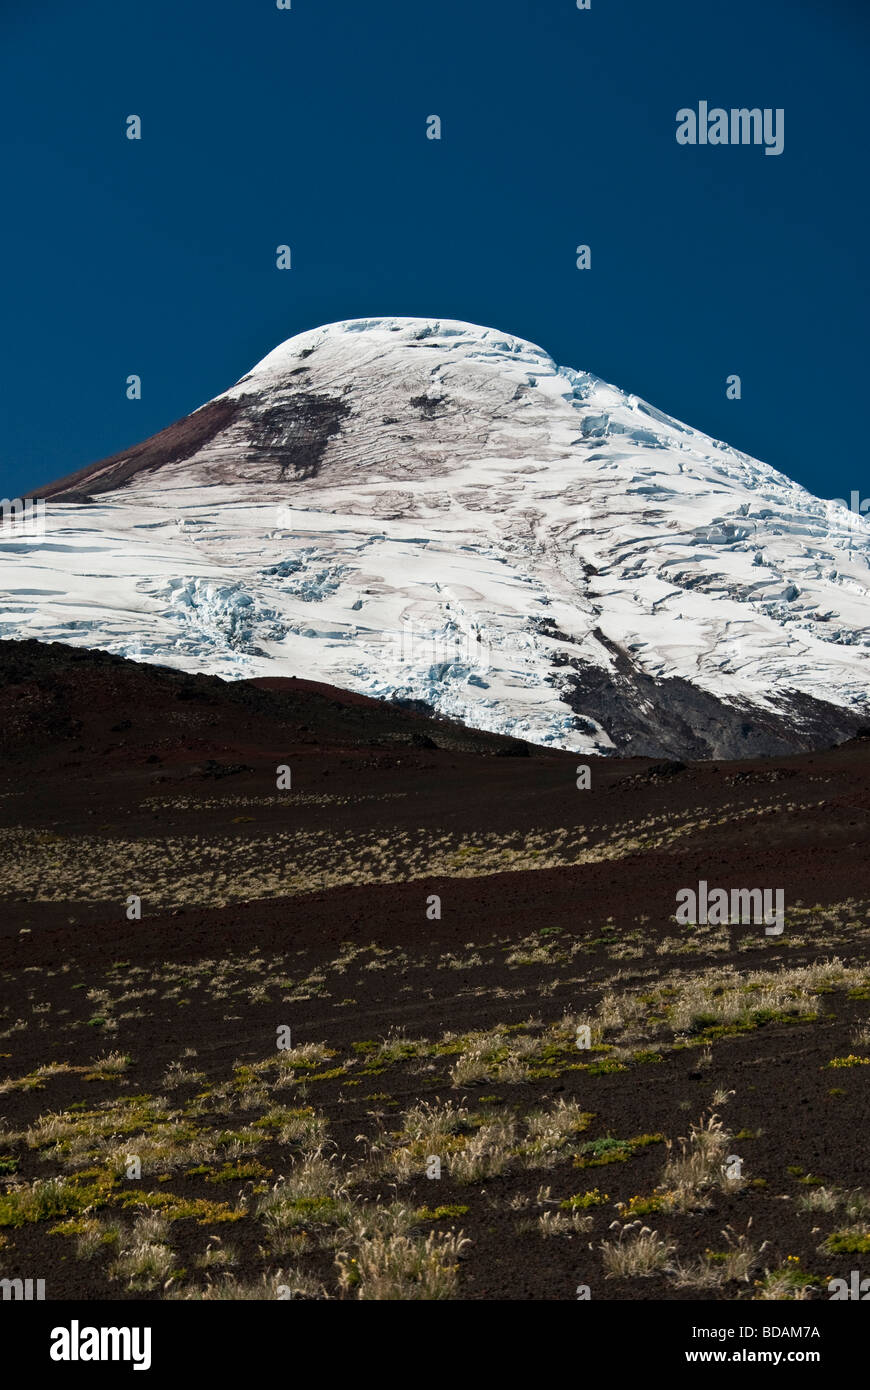 Vulcano Osorno, Glaciers crevasse, cracks. - Stock Image